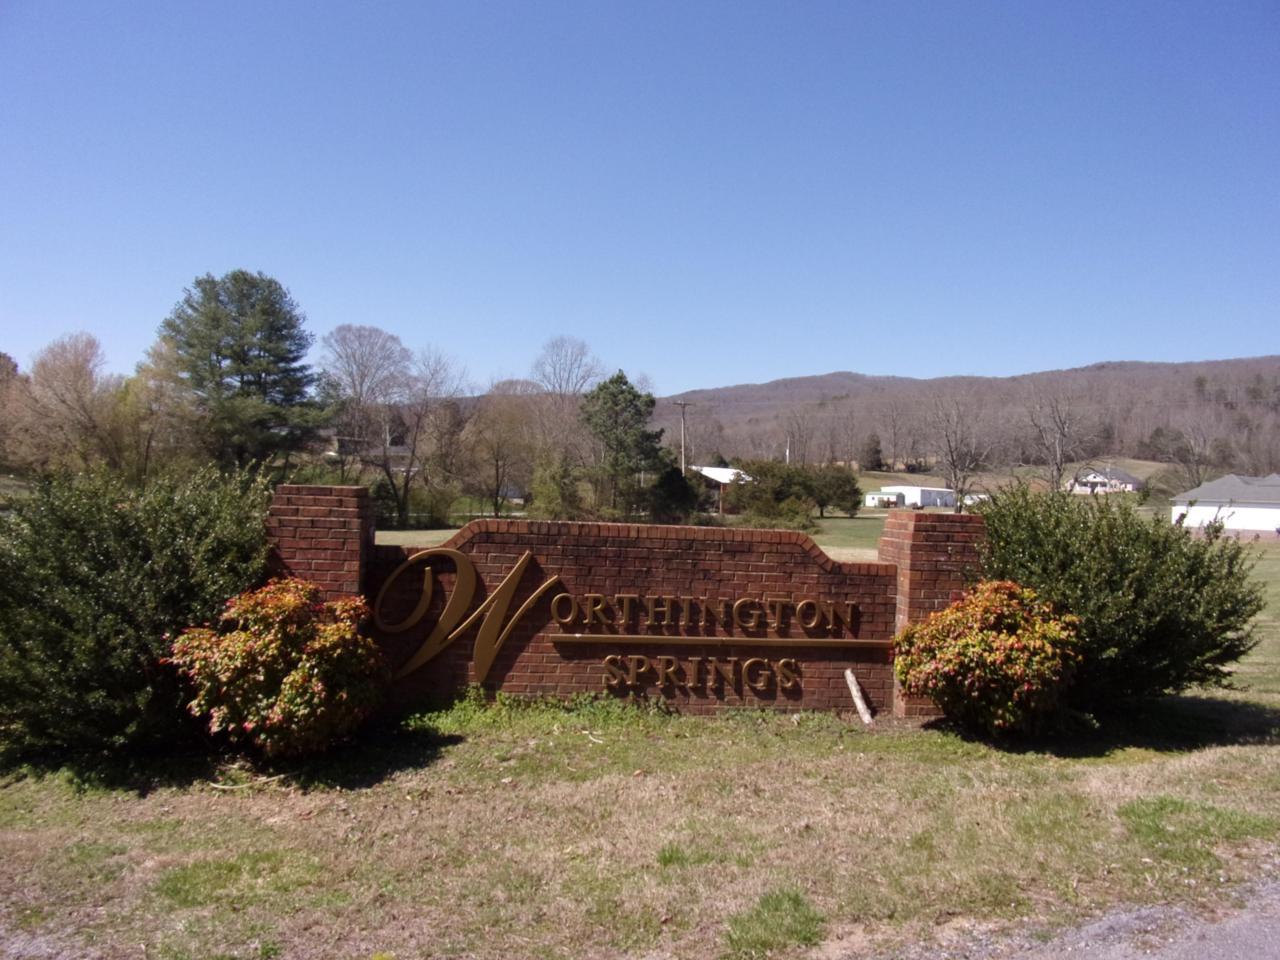 0 Worthington Springs Dr - Photo 1